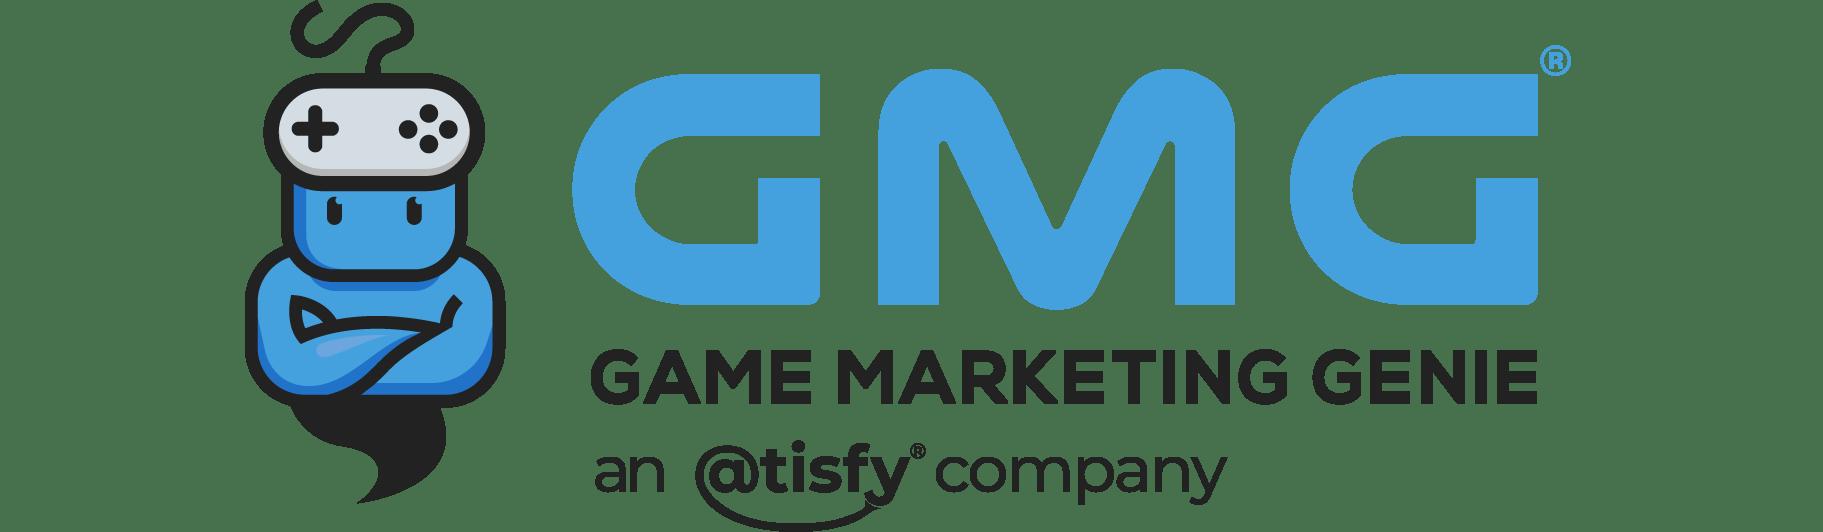 GameMG_AnAtisfyCo_Logo_RGB_Left_Aligned_Crop-Top-Bottom